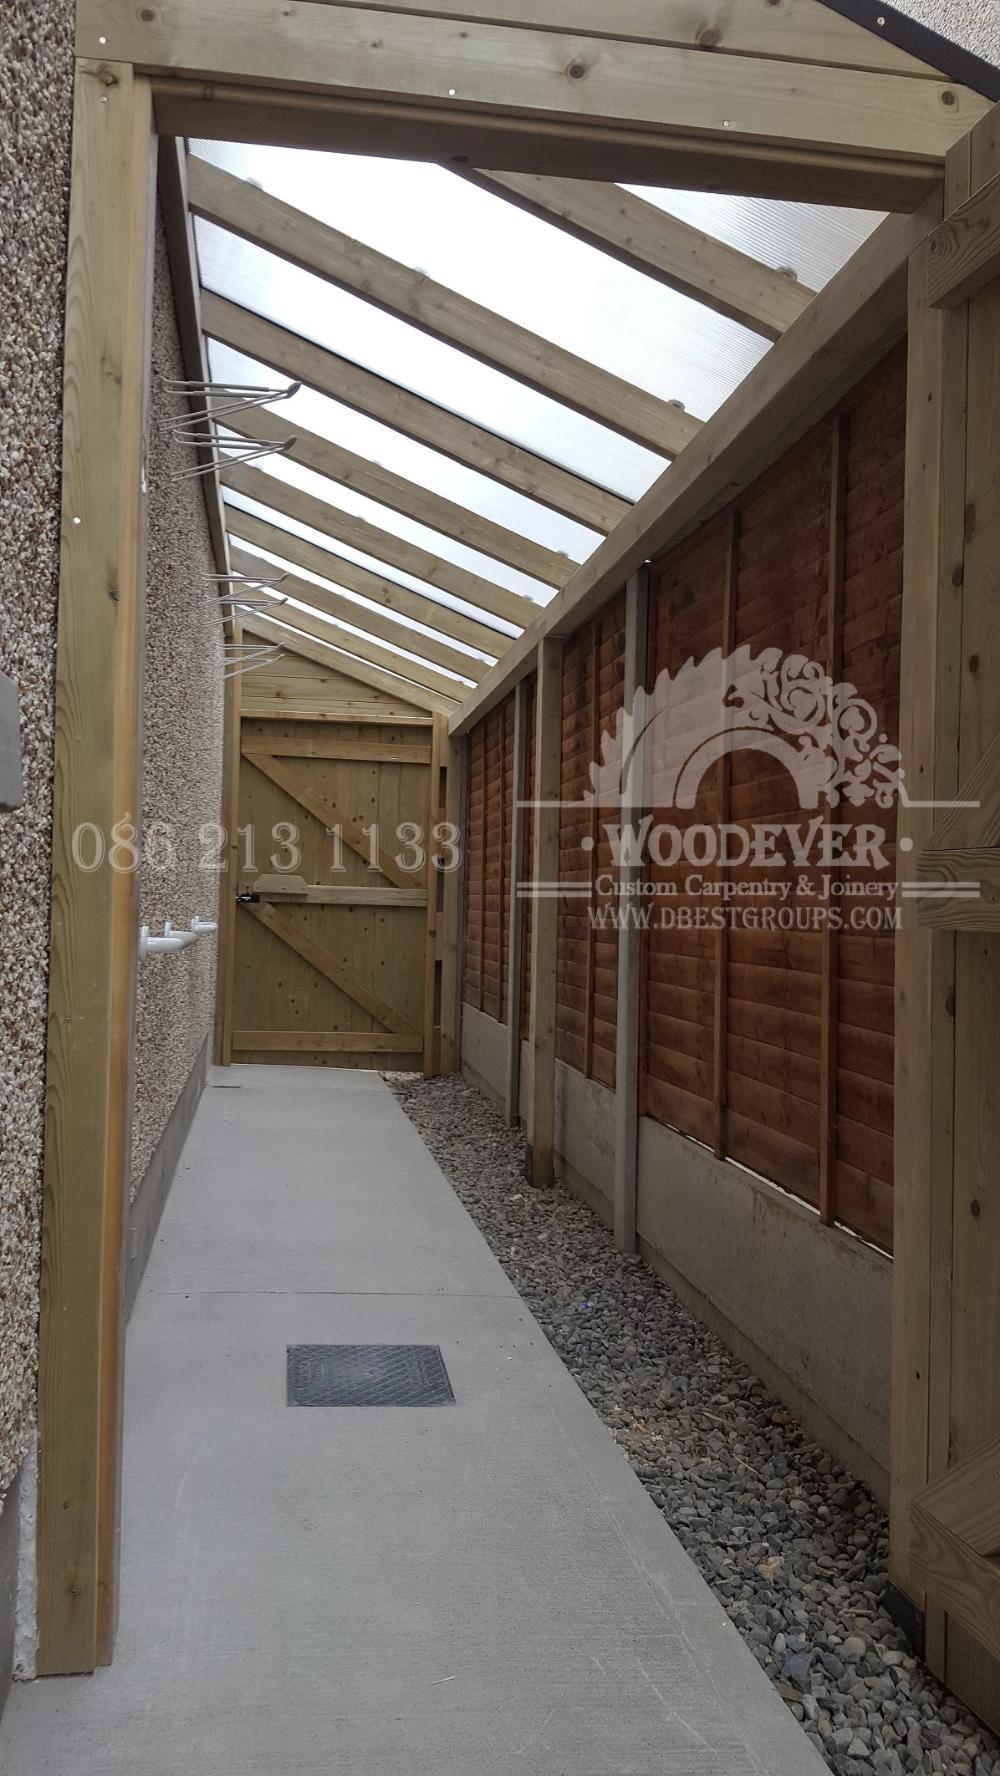 Woodever Carpentry L Carpenter L Custom Handmade Garden Furniture In 2020 Garden Storage Lean To Lean To Shed